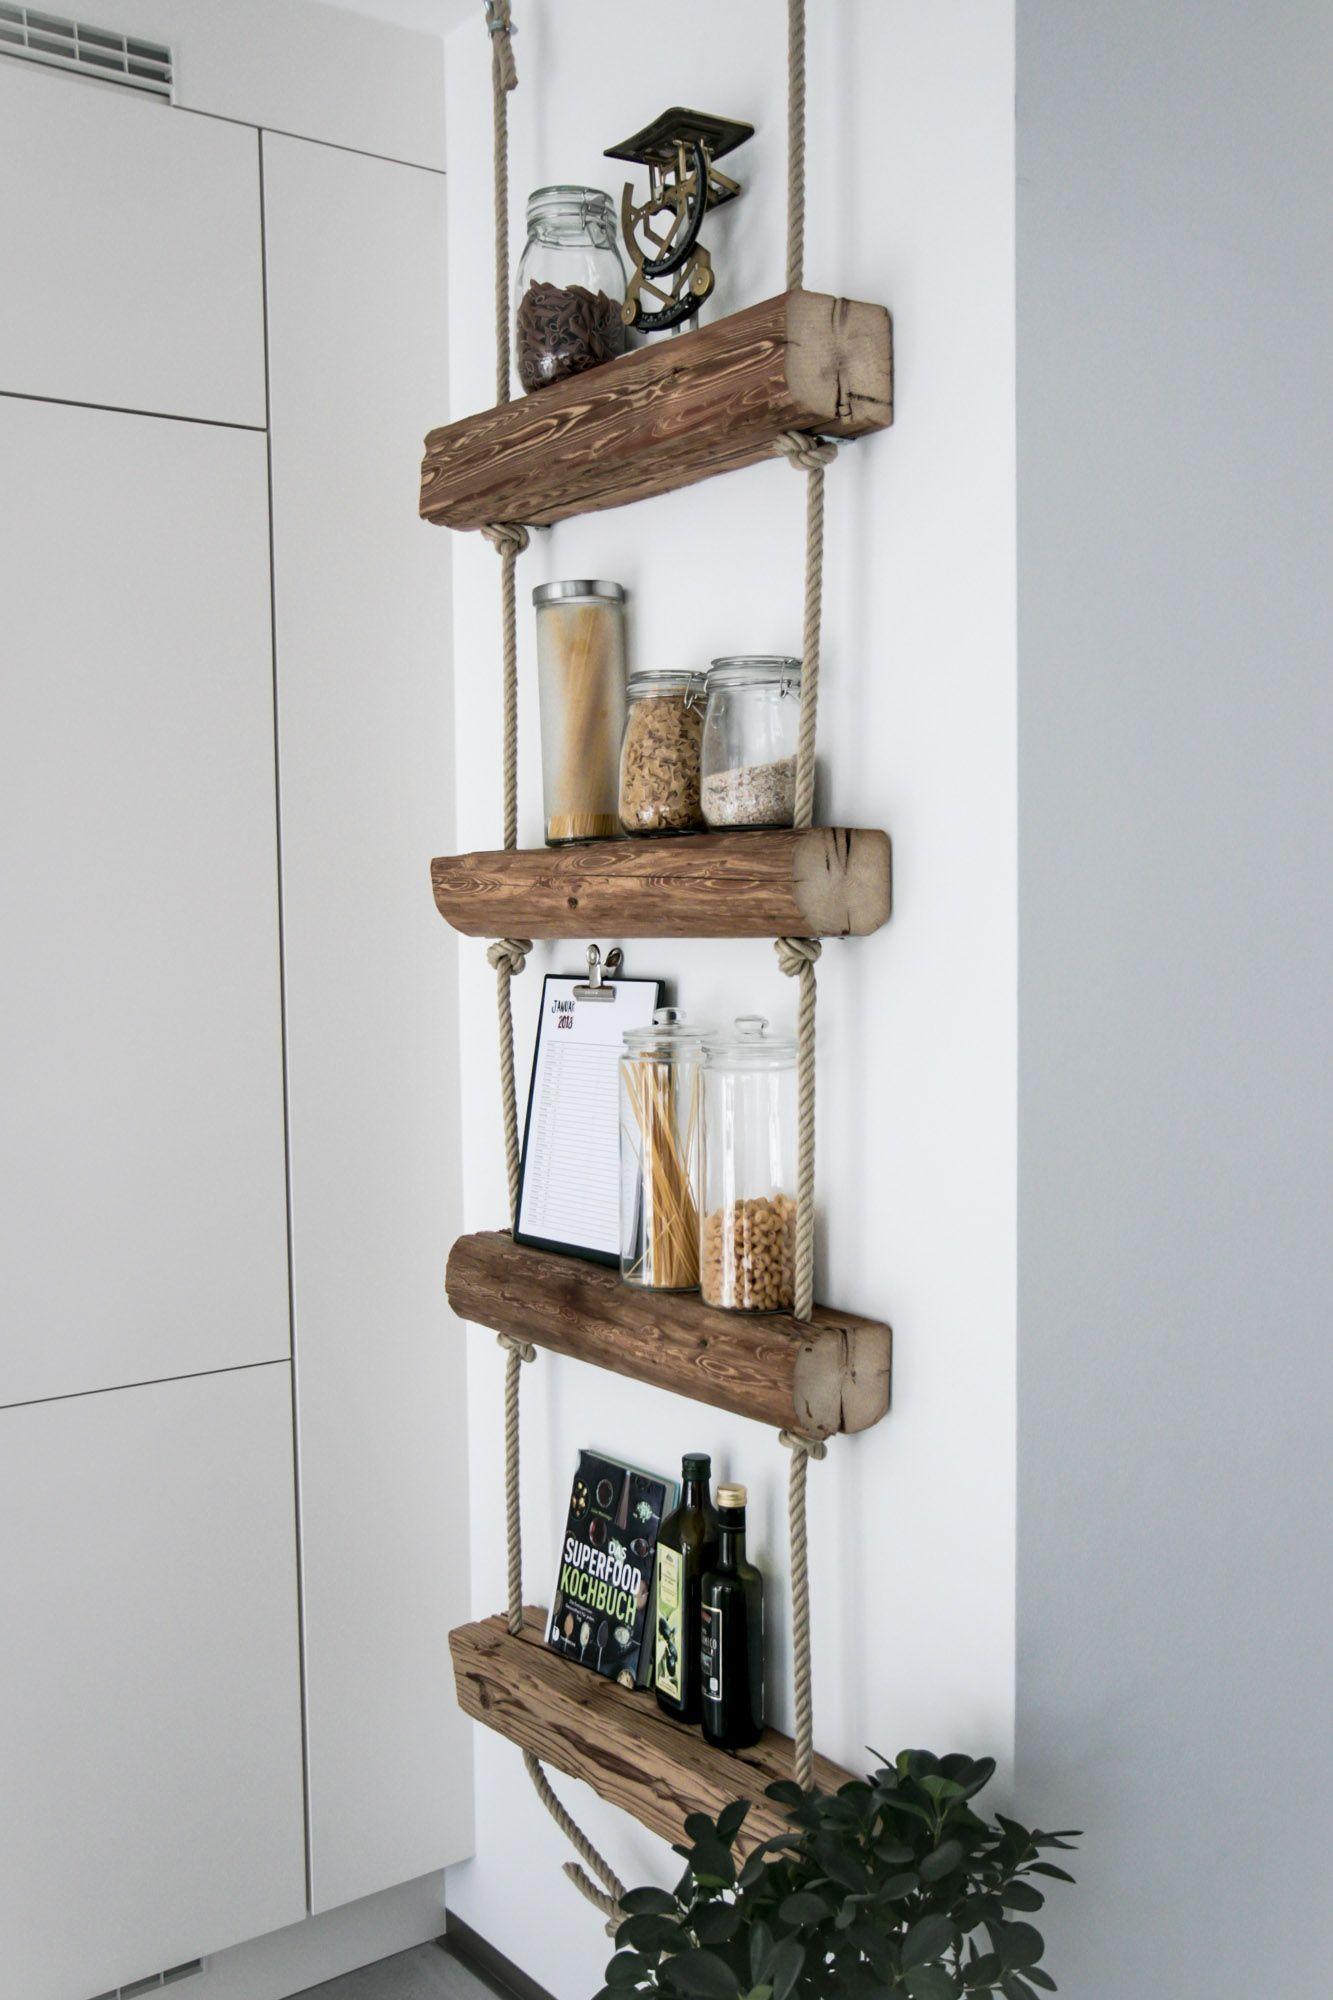 Oben Badezimmer Regal Altholz Ideen Und Inspiration Badezimmerschrank Driftwood Crafts Decor Home Diy